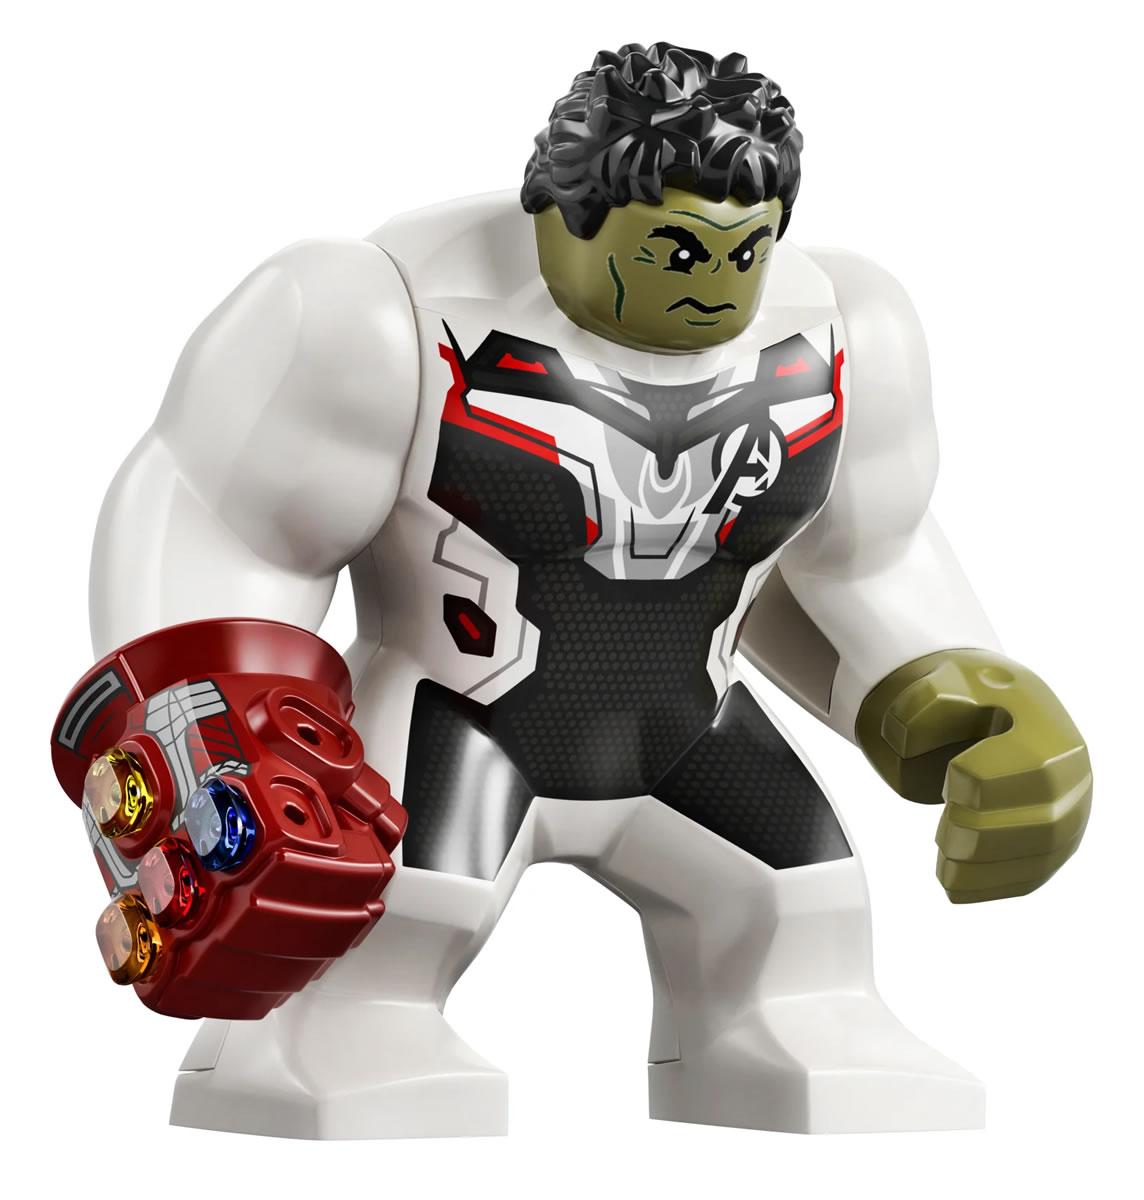 lego-marvel-super-heroes-avengers-endgame-hulk-helicopter-drop-76144-2019-bigfig-hulk-infinity-handschuh zusammengebaut.com